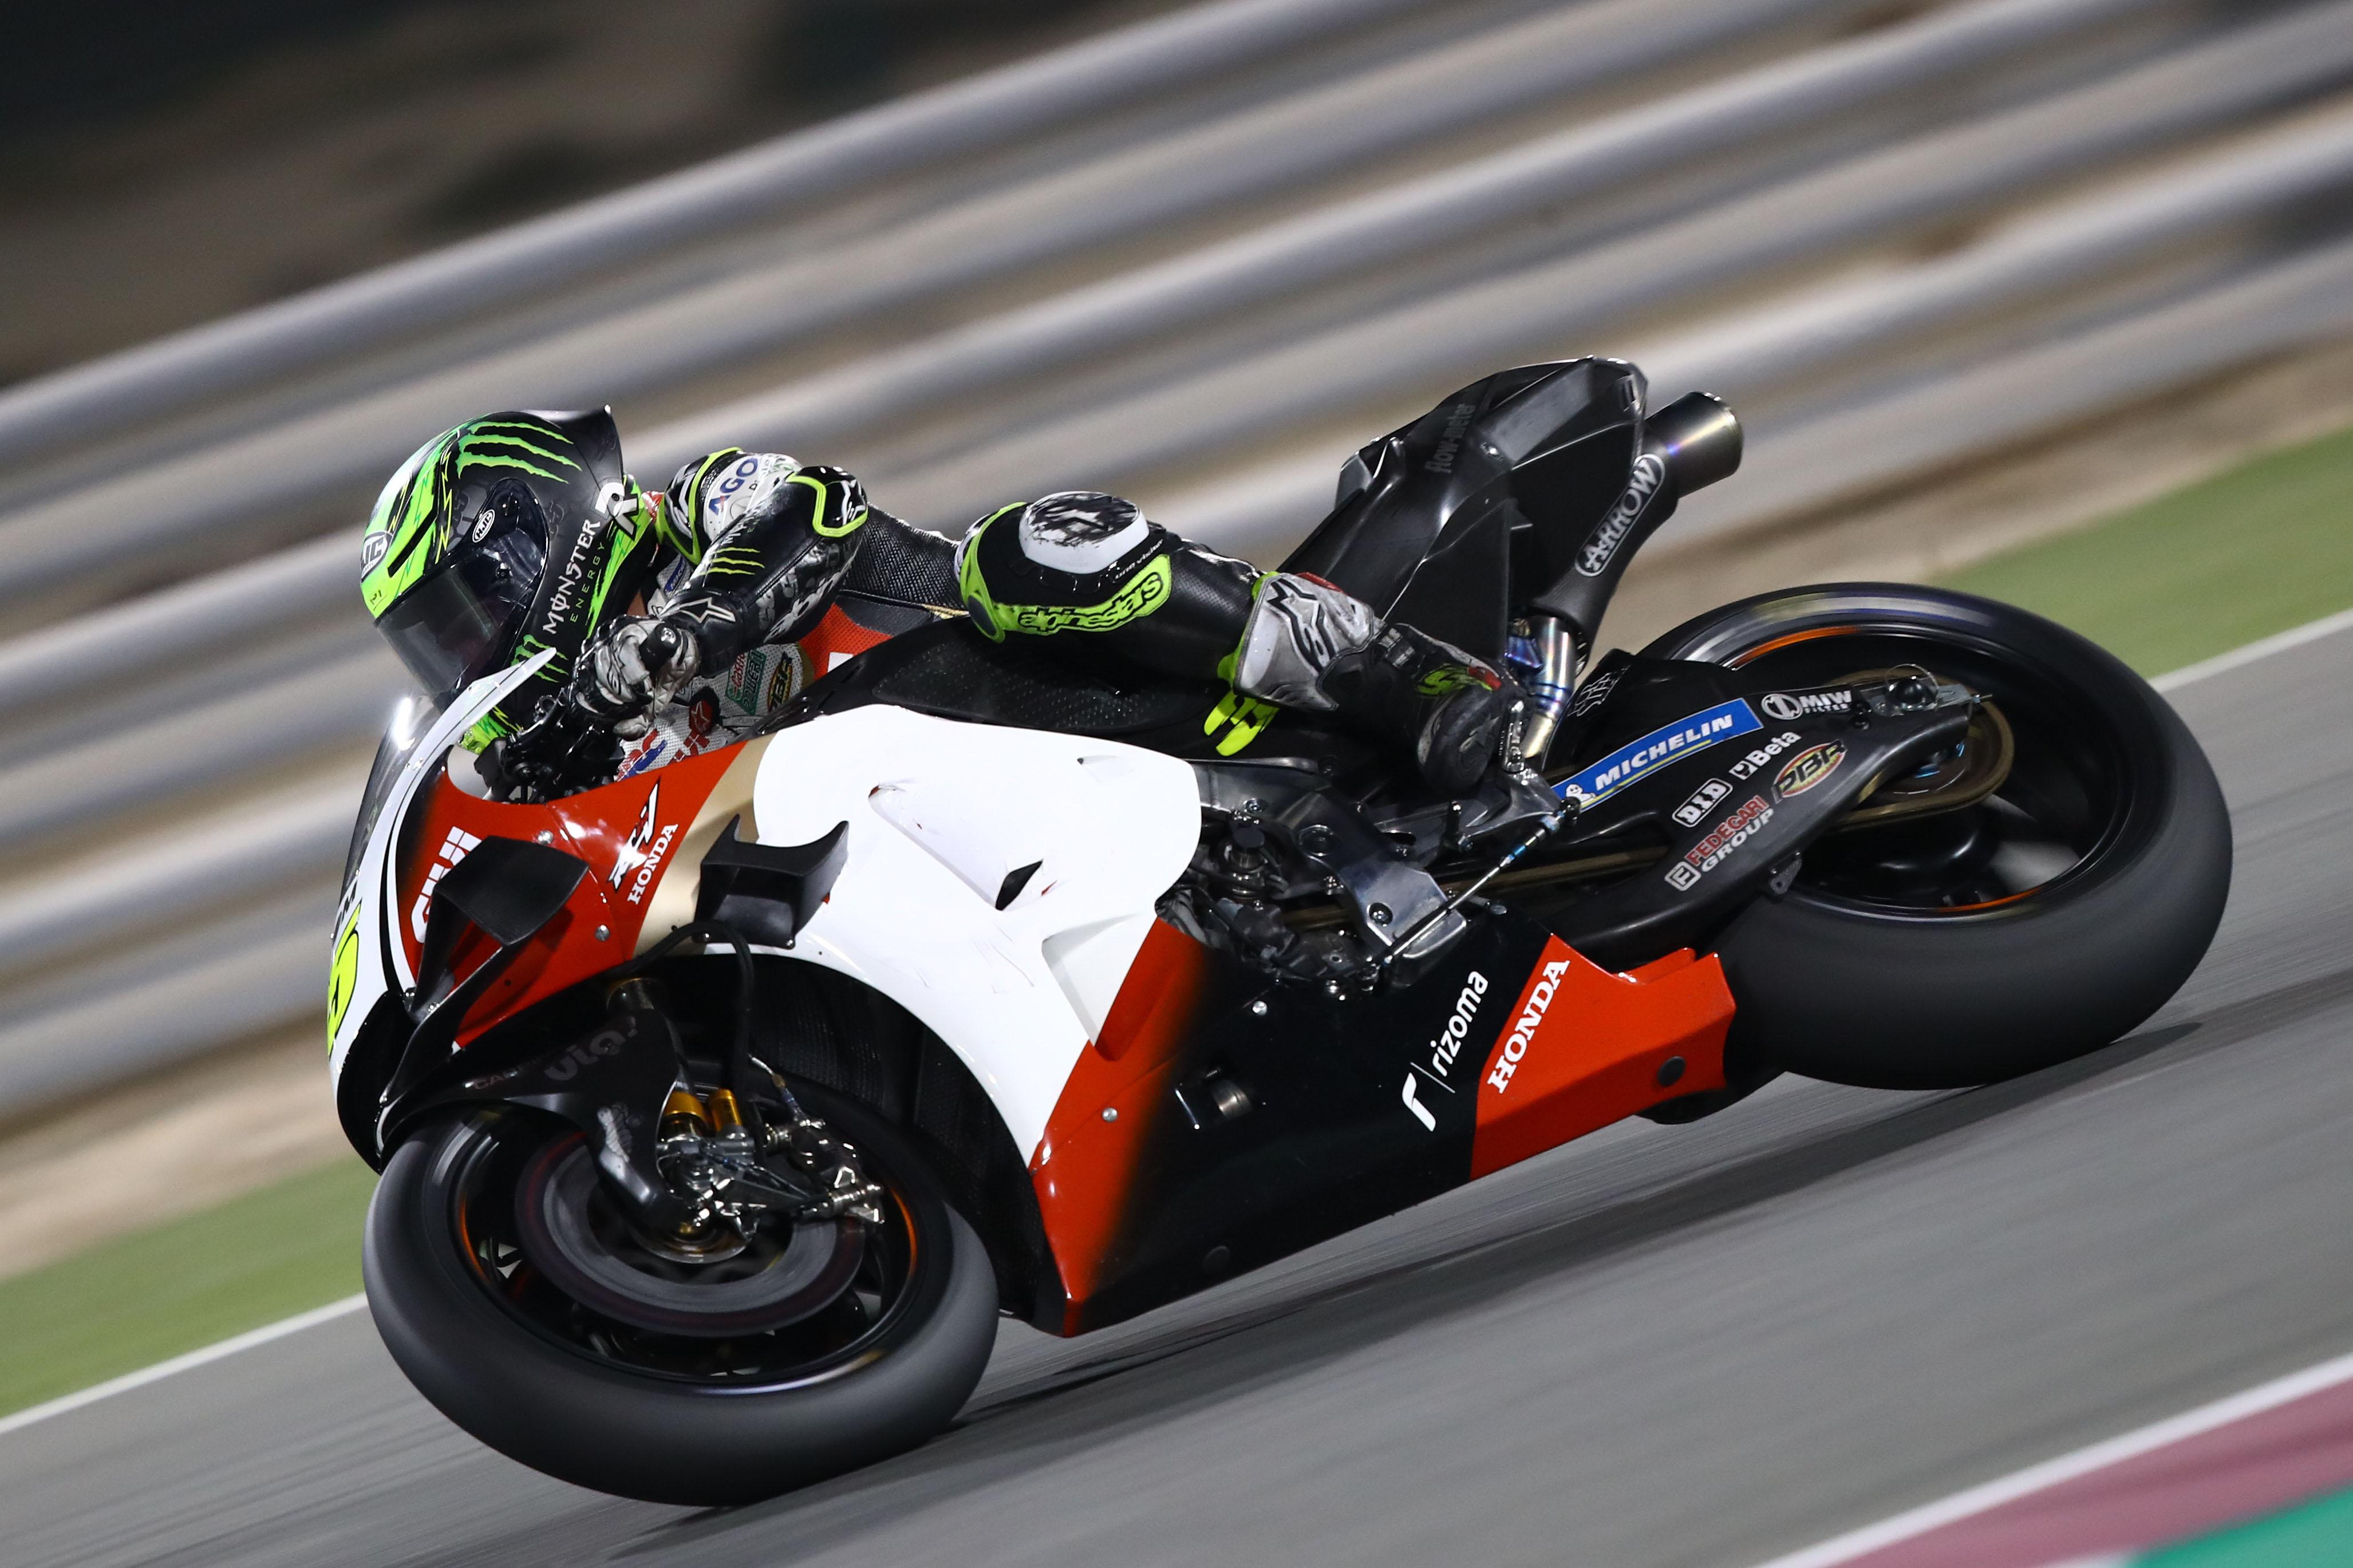 Cal Crutchlow LCR Honda Qatar MotoGP test 2020